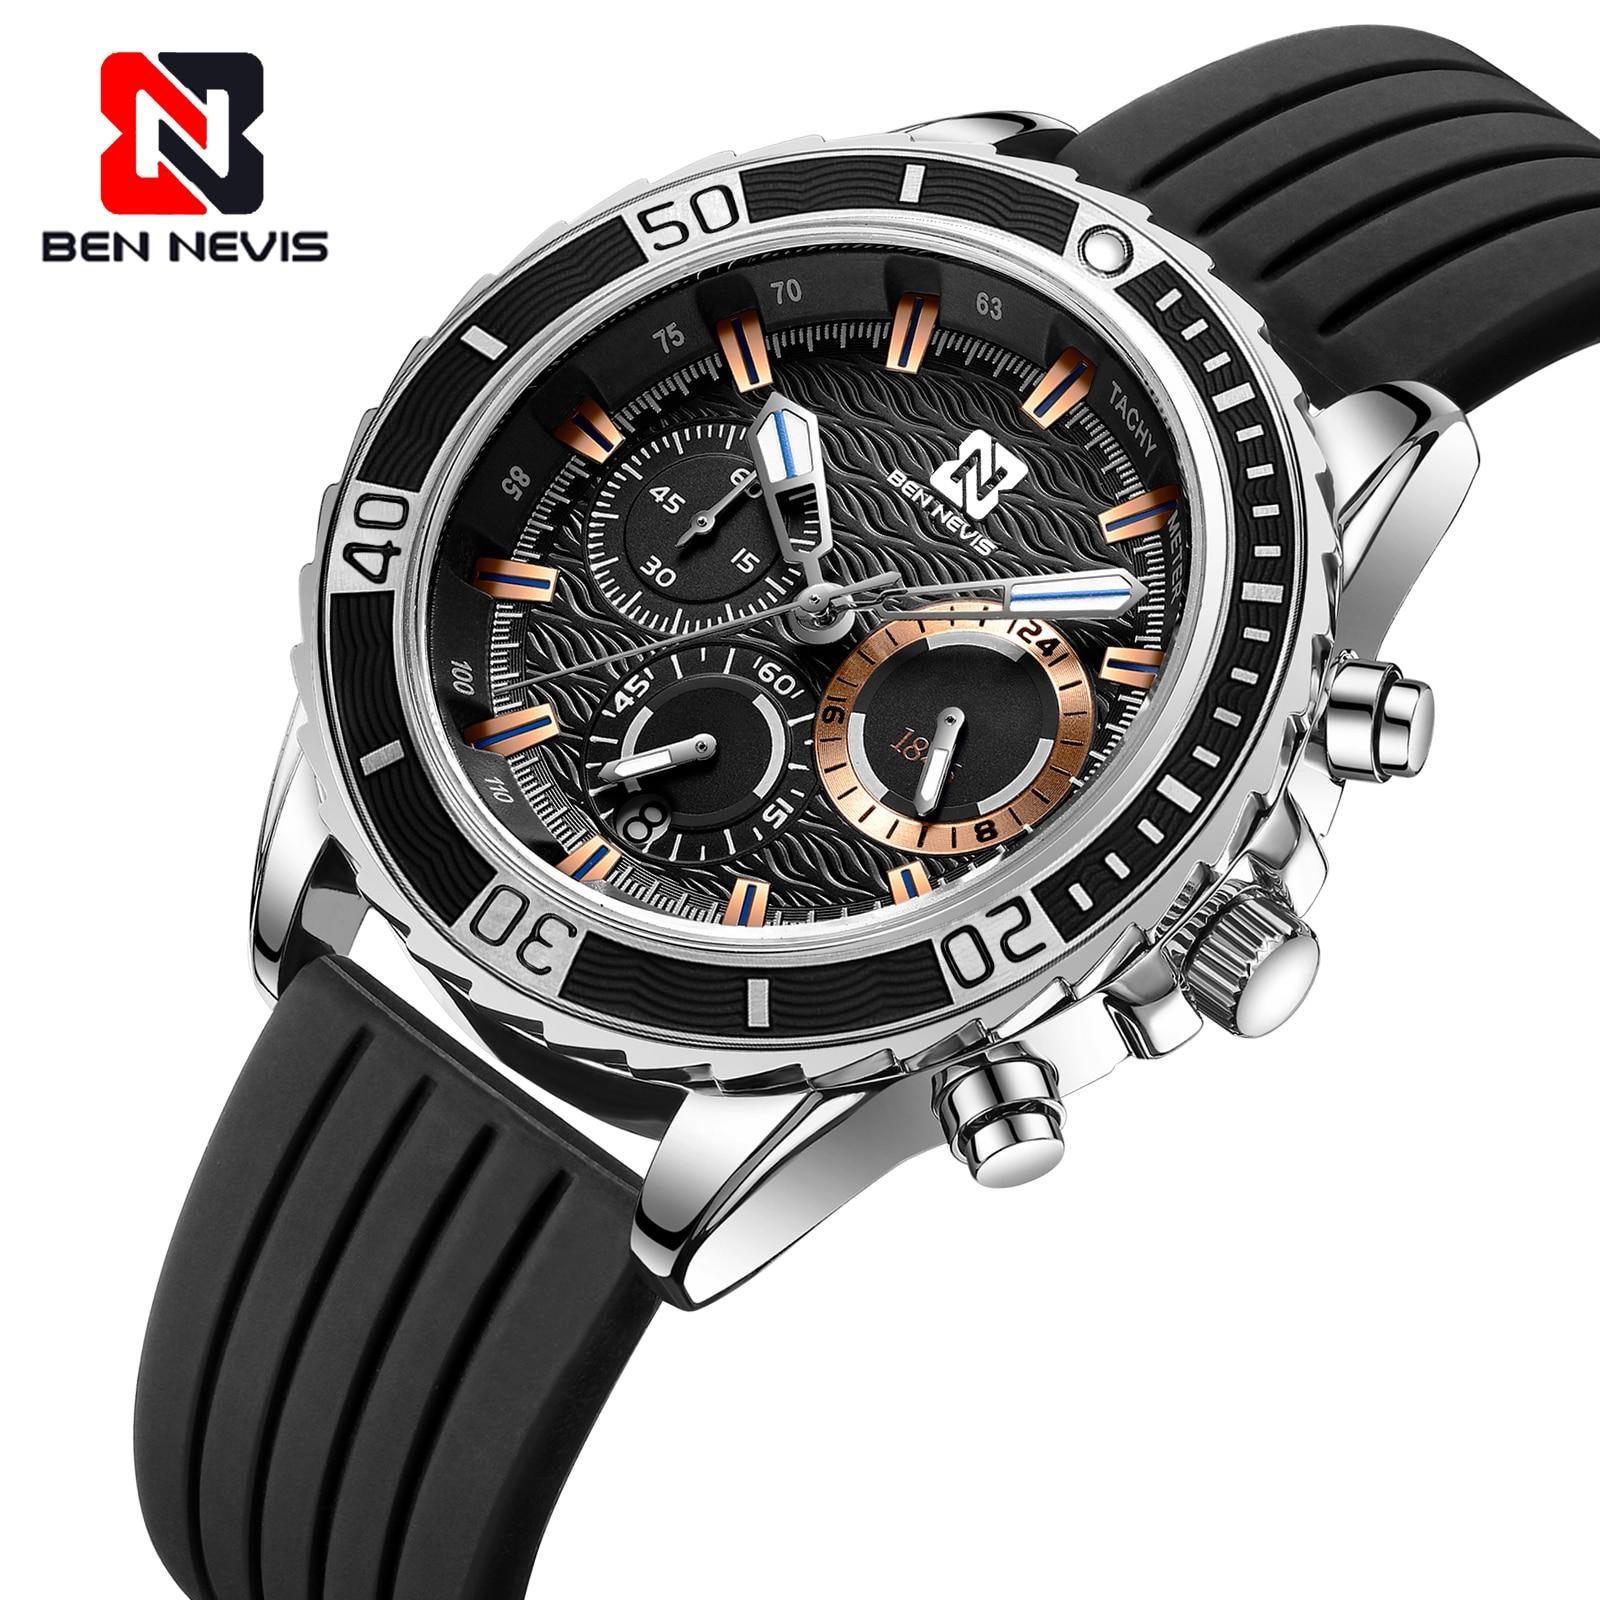 Ben Nevis Fashion Sport Business Quartz Watch For Men luxury Wristwatch Military Watch Male Waterproof Clock Innrech Market.com